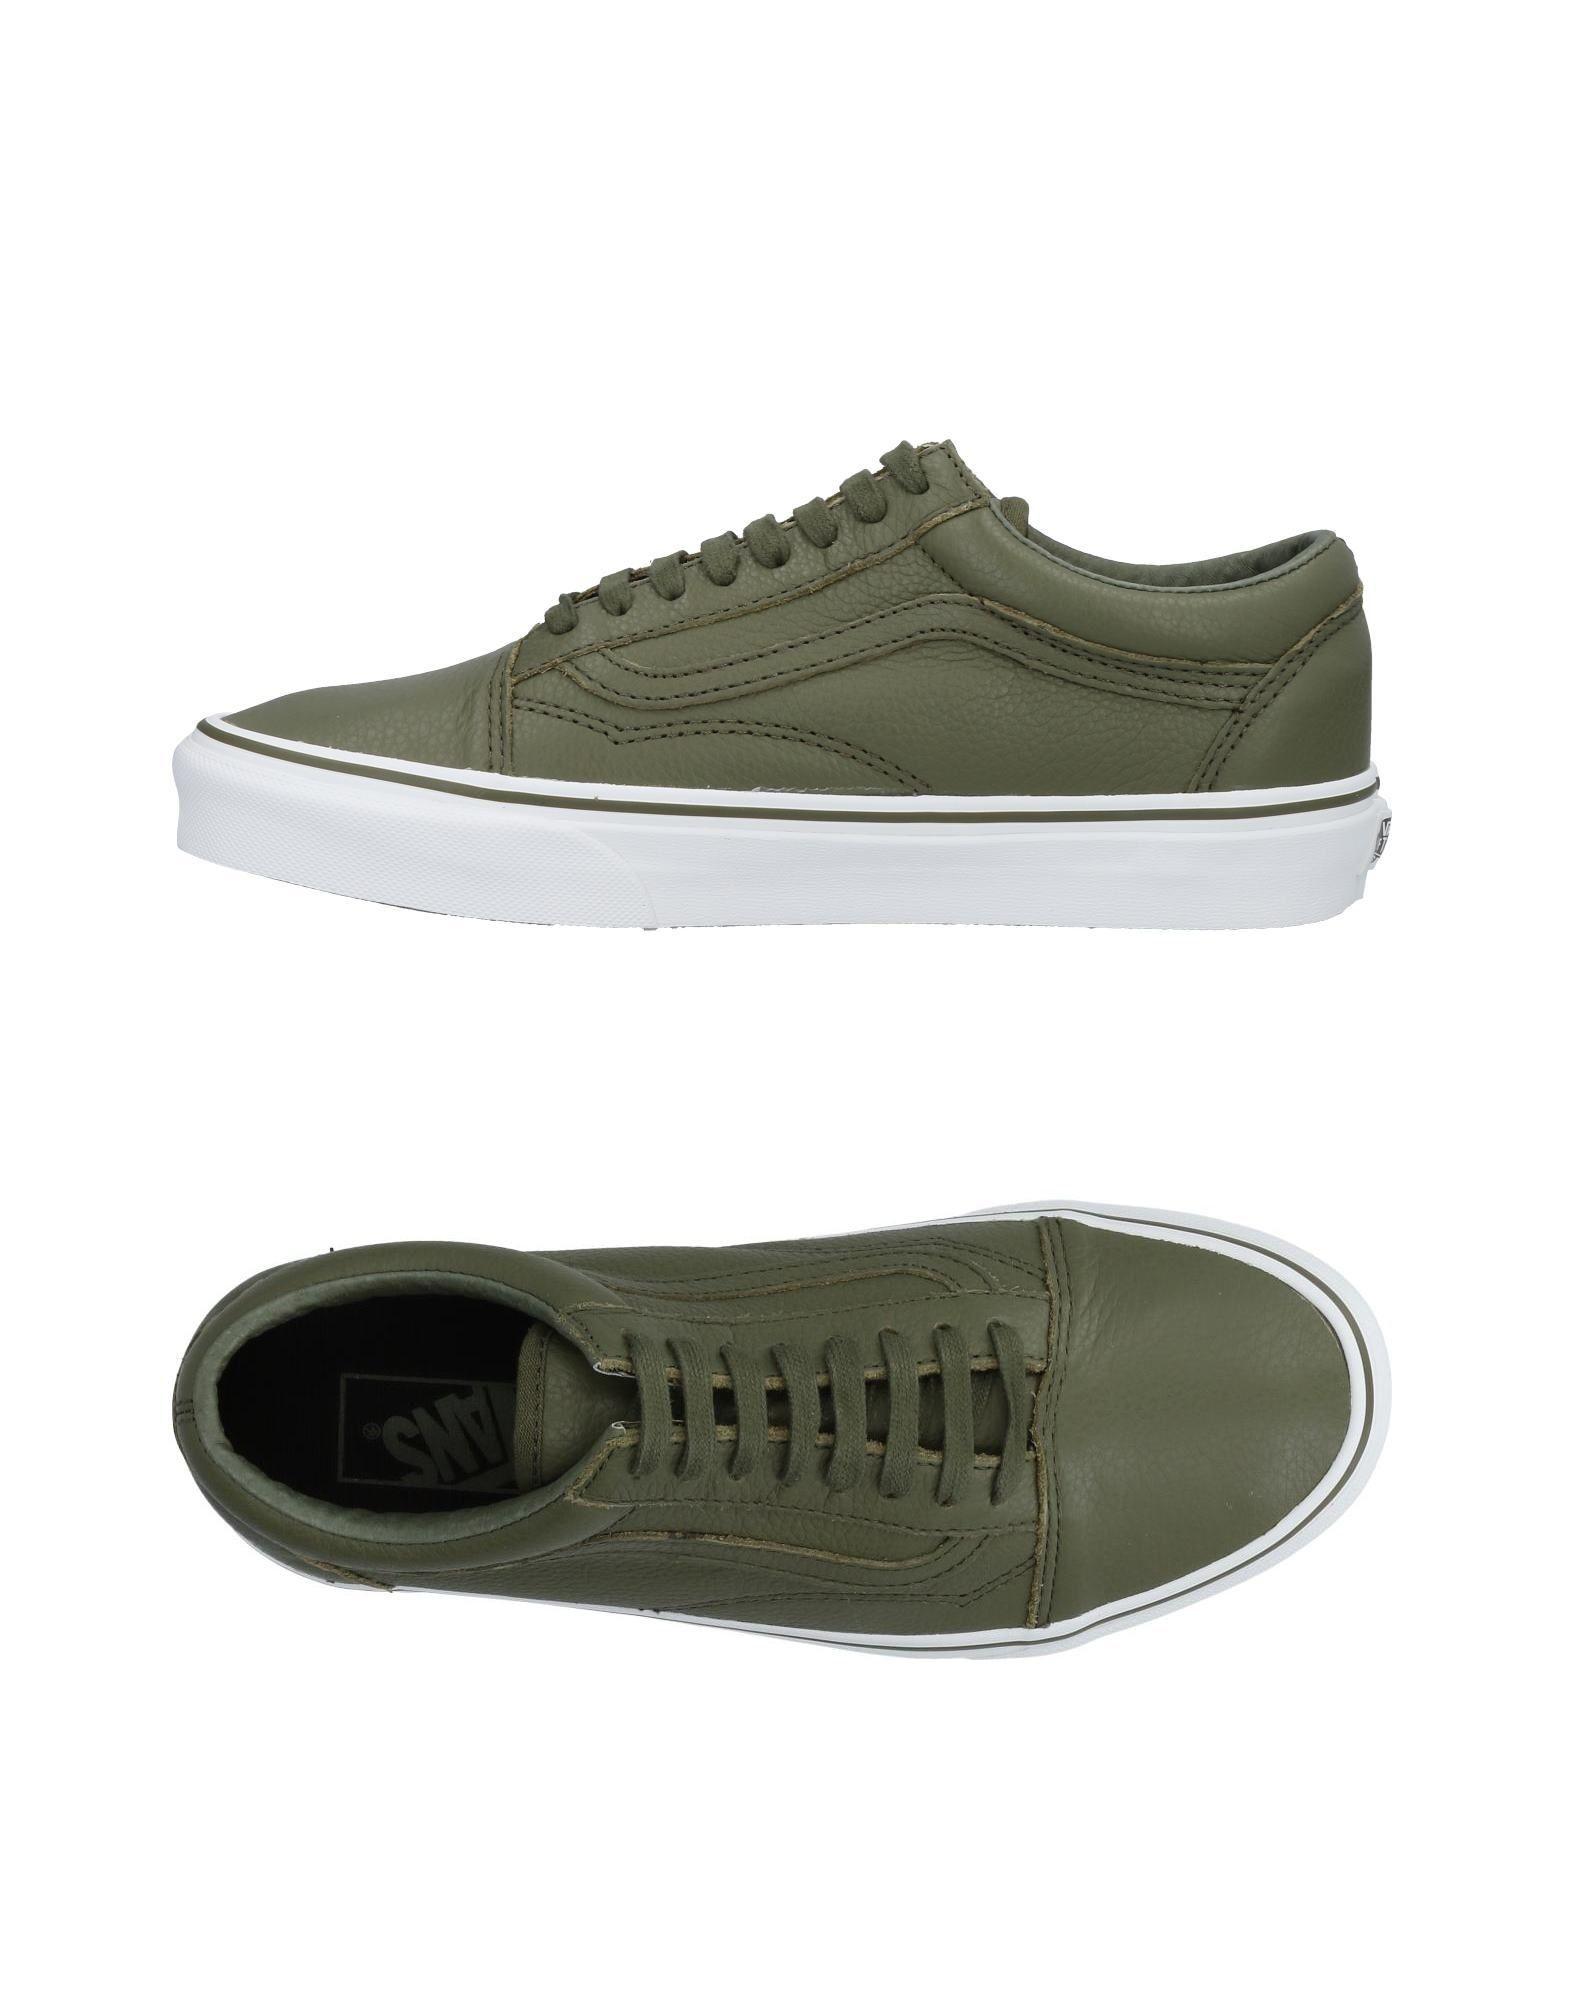 d401557f26 Vans - Ταξινομημένα Προϊόντα - Φθηνότερα Προϊόντα - Σελίδα 43 ...